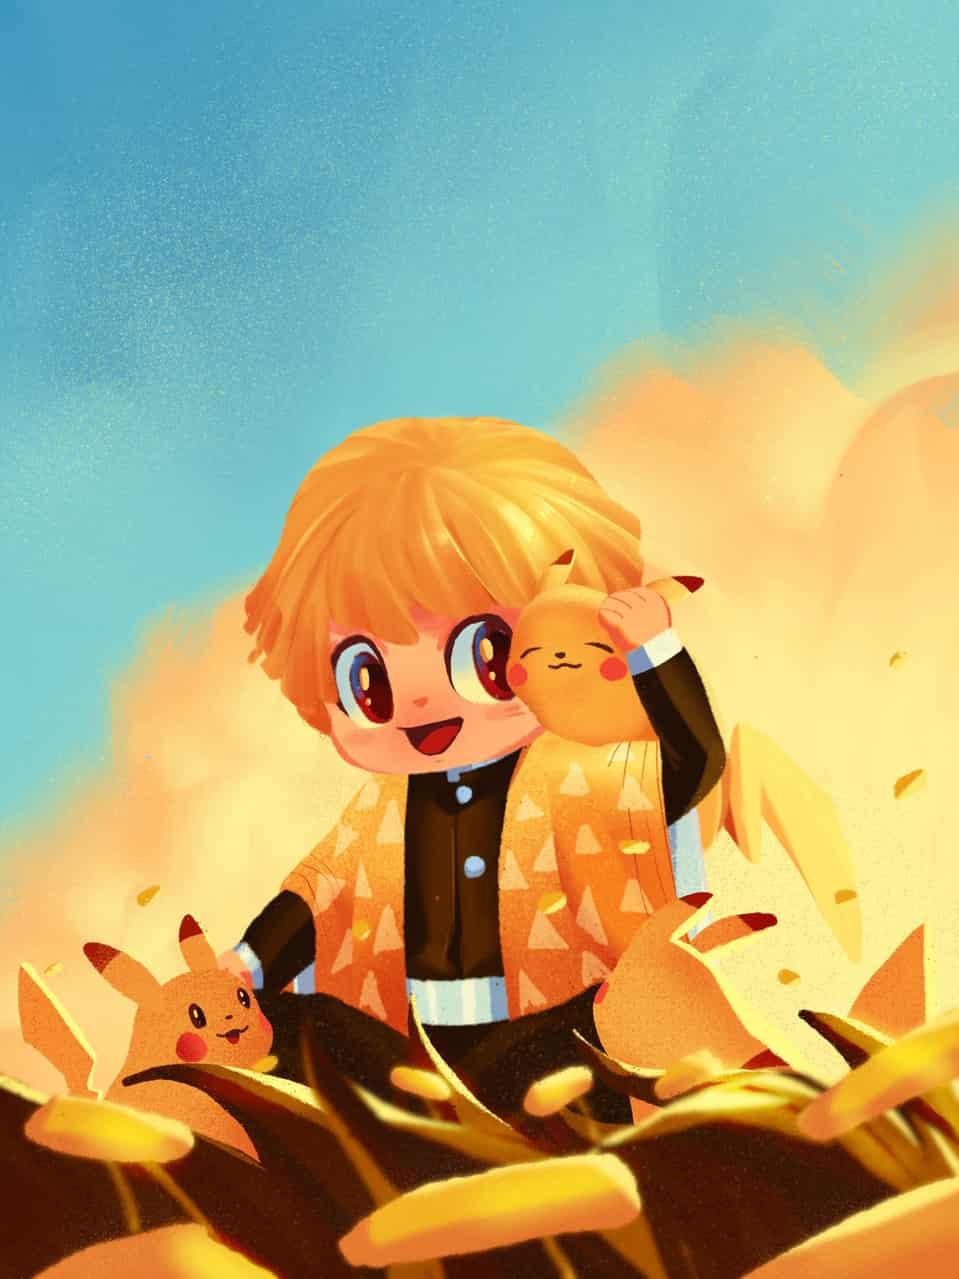 Zenitsu Agatsuma & Pikachu | Procreate on Ipad Illust of KICKYOURART fantasy AgatsumaZenitsu KimetsunoYaiba